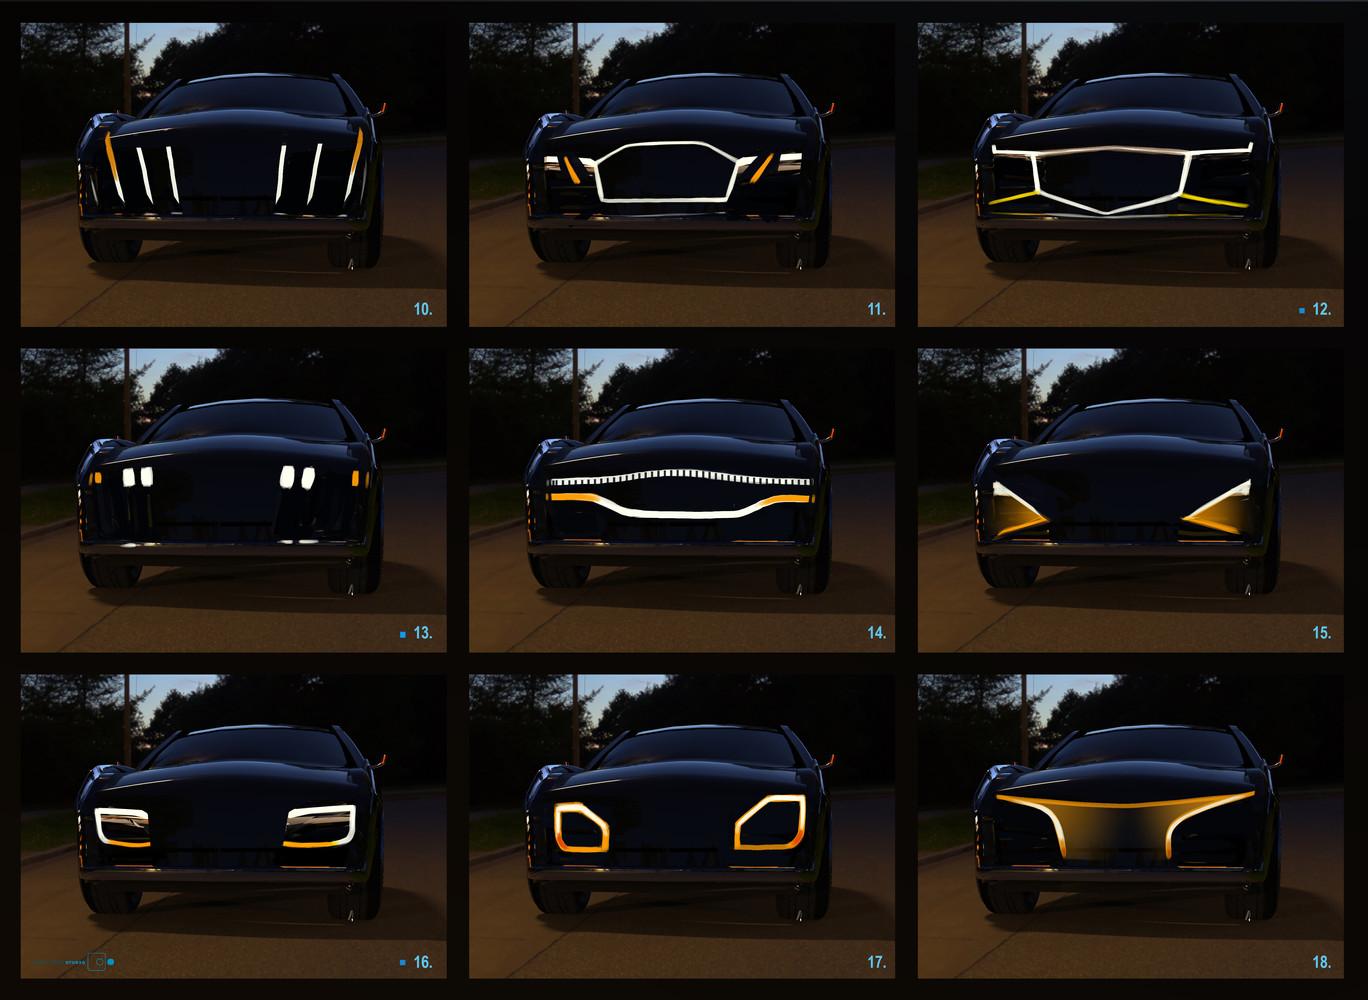 headlights10-18.jpg